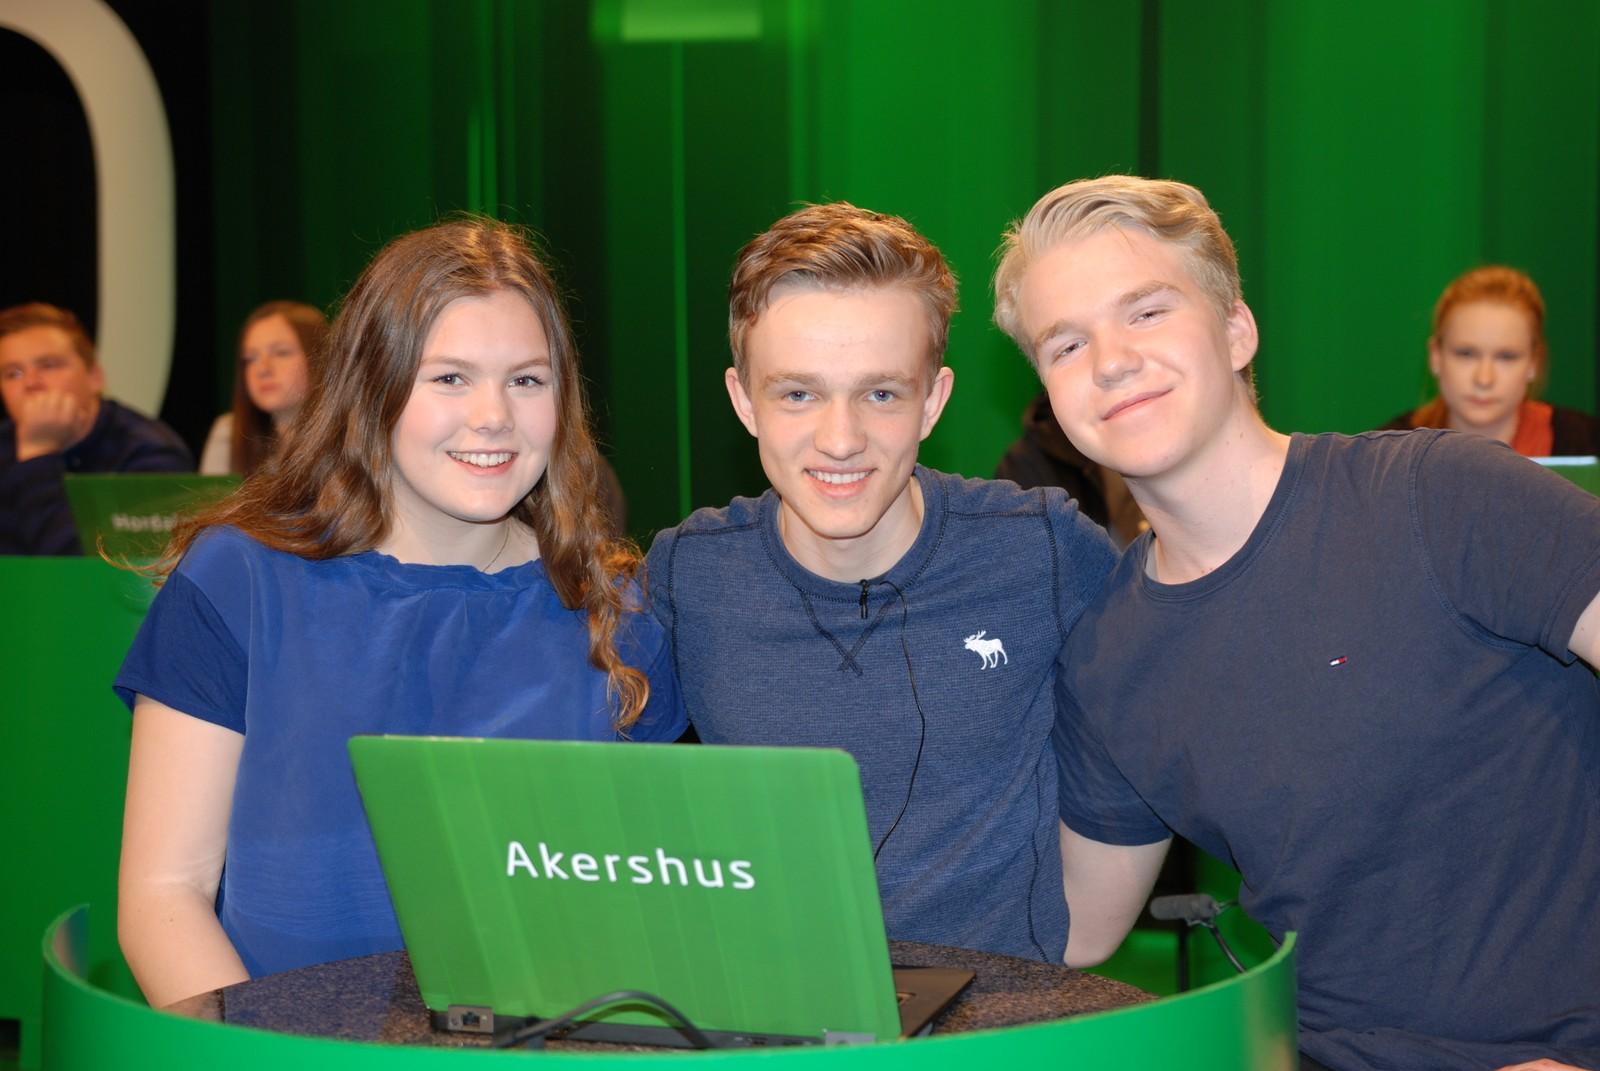 AKERSHUS: Solvang Skole fra Asker representert ved Vebjørn Soknes Christie, Henrik Fredriksen Aas og Tora Vassnes